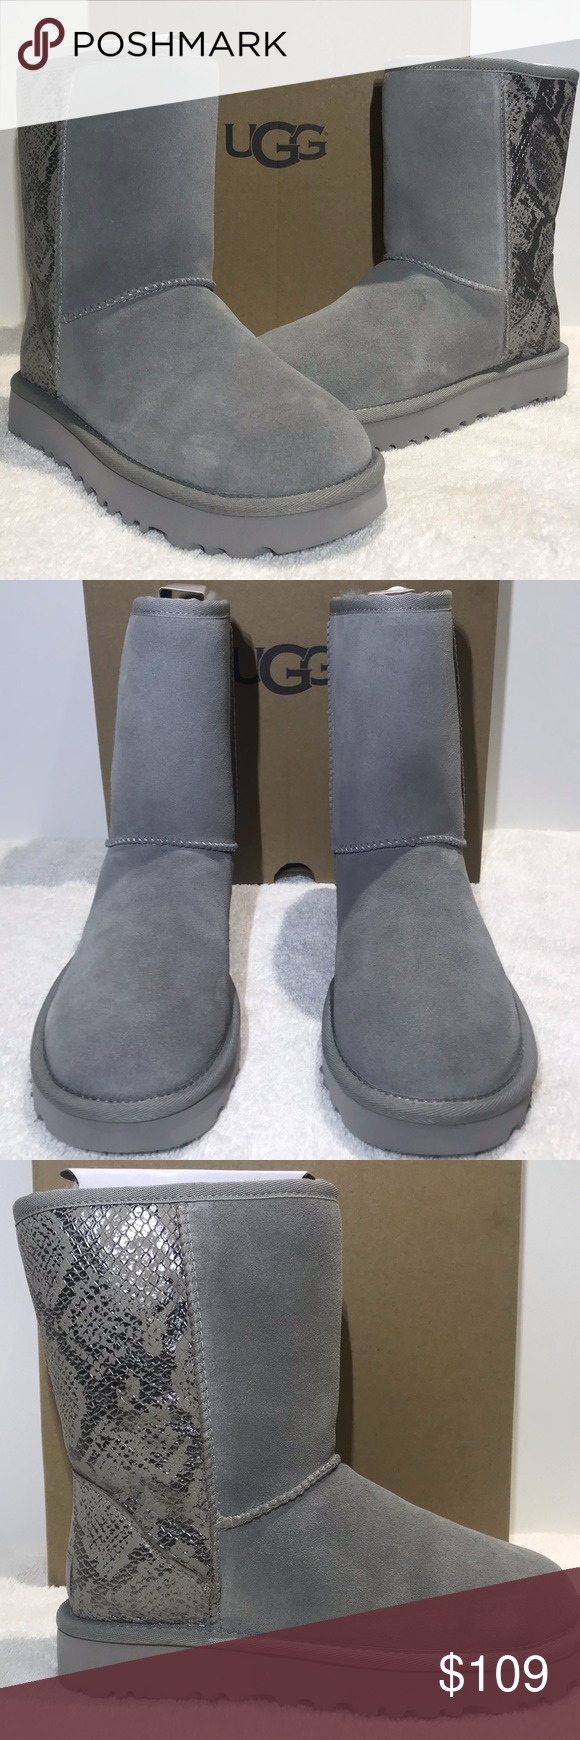 9a6f9a40650 UGG Classic Short Metallic Snake Boots 1101473 UGG Classic Short ...